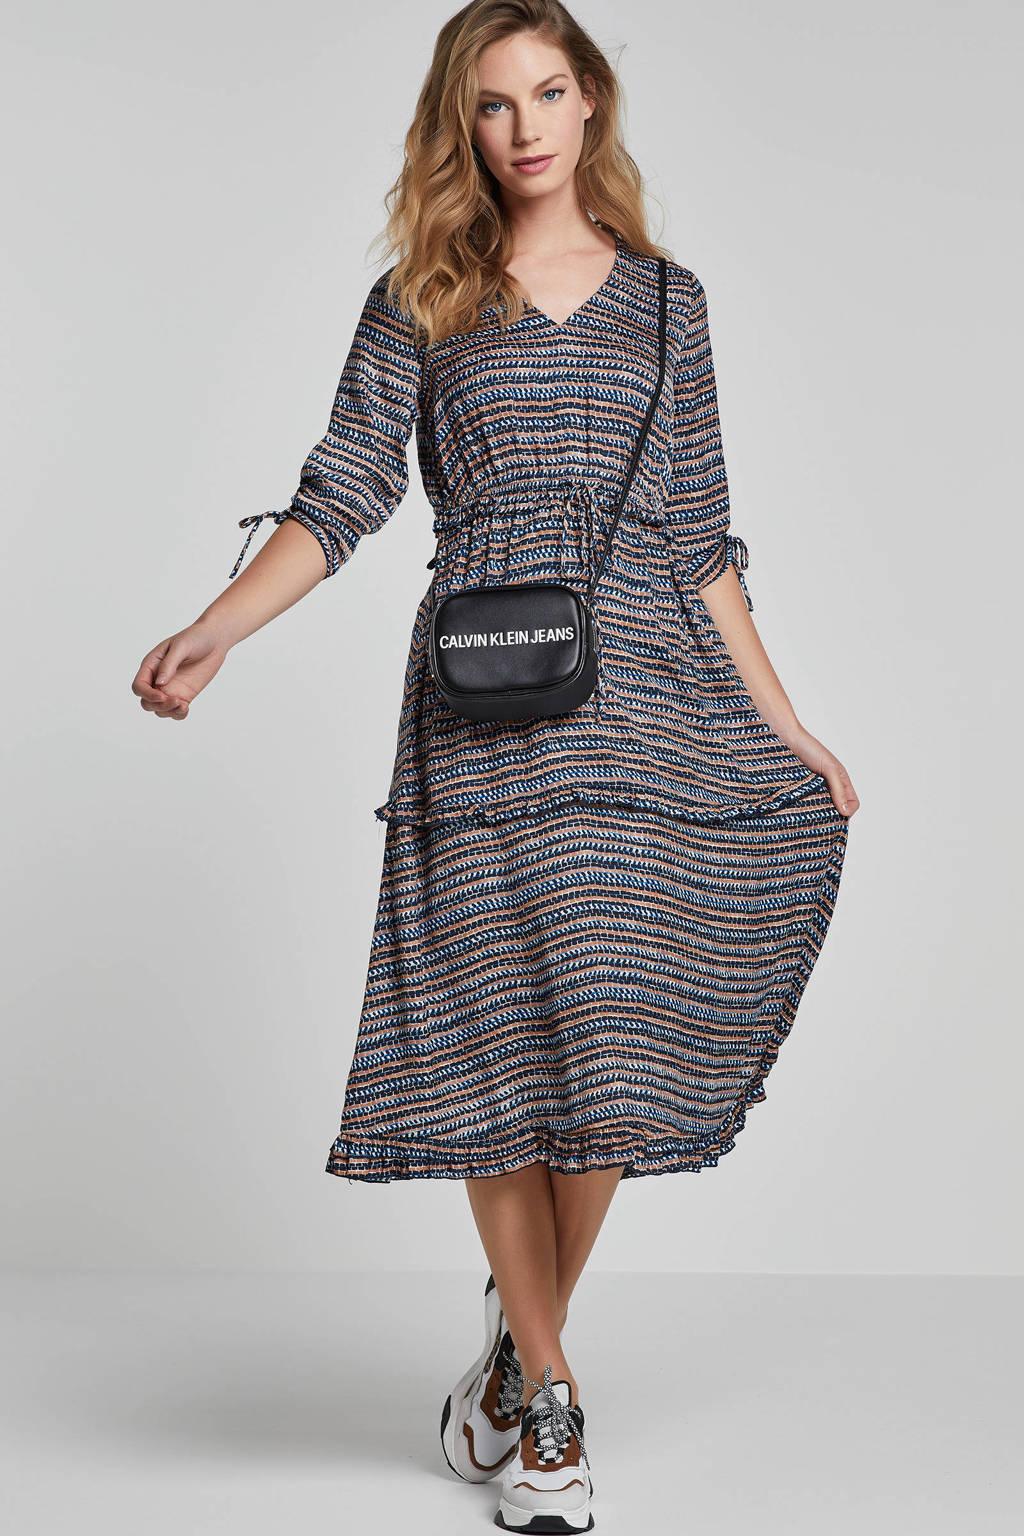 Scotch & Soda jurk met grafische print, Blauw/ bruin